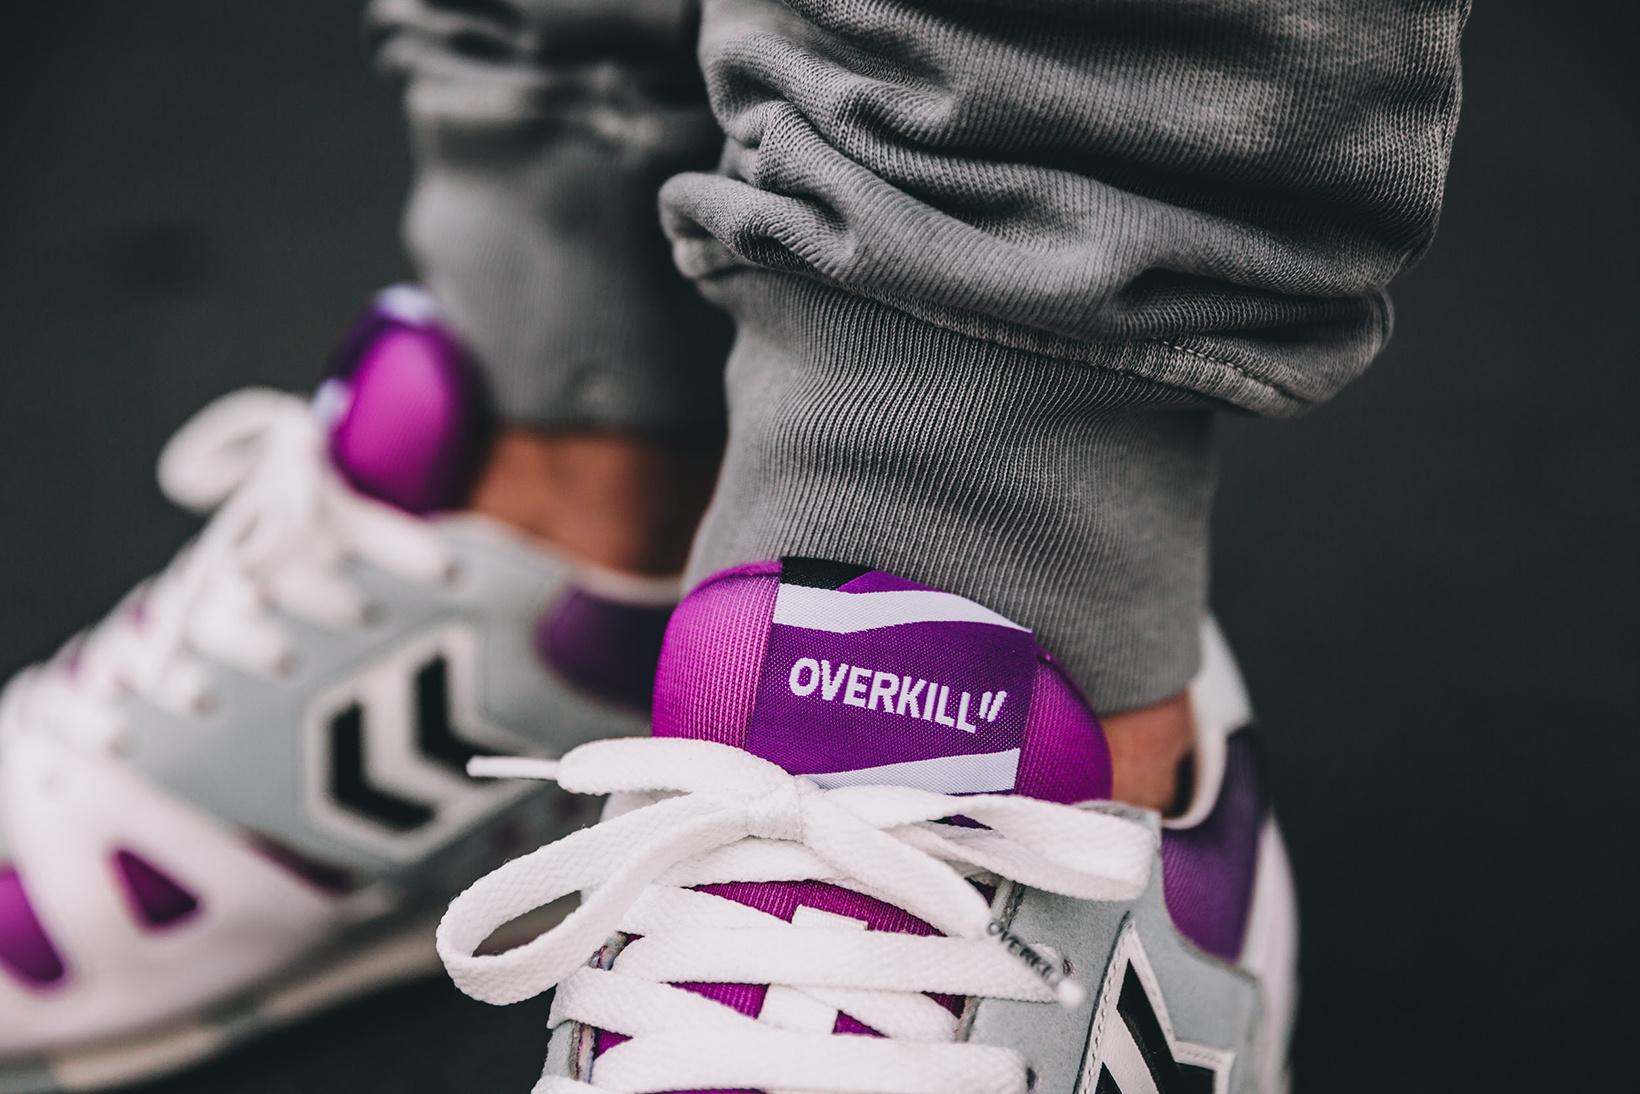 Overkill x Hummel Marathona - TRENDS periodical